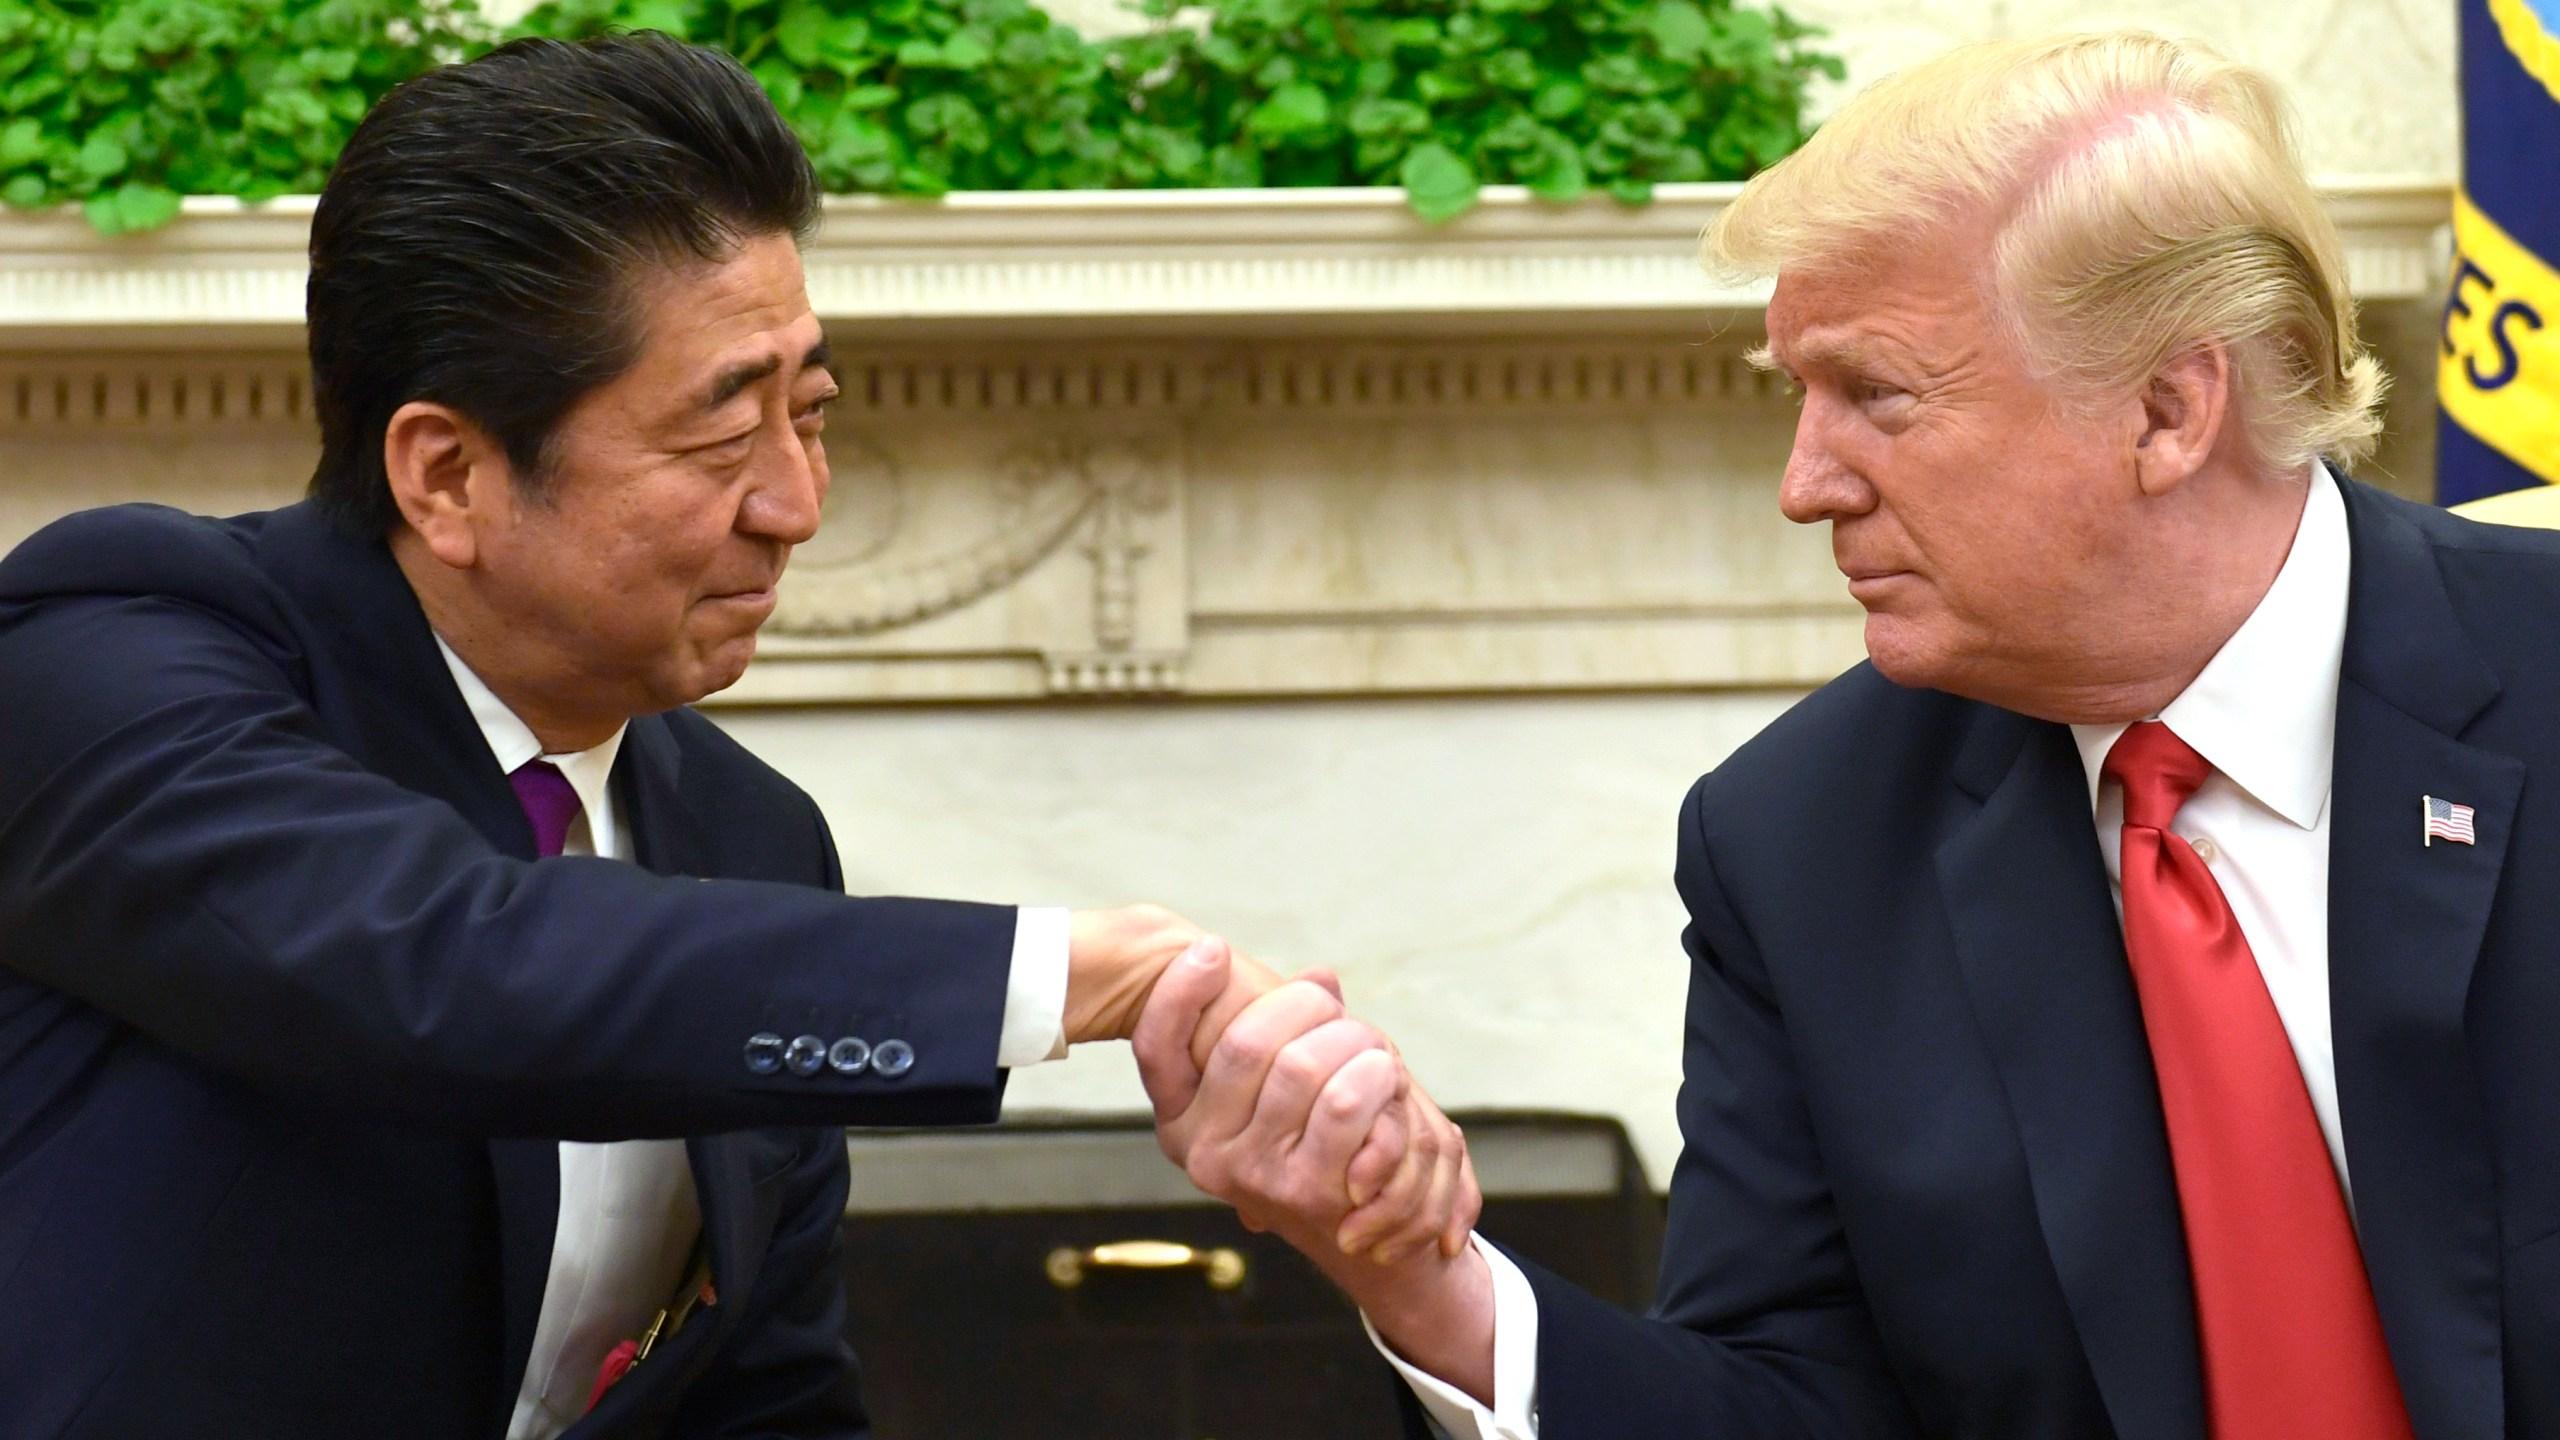 Trump_US_Japan_27882-159532.jpg45979273